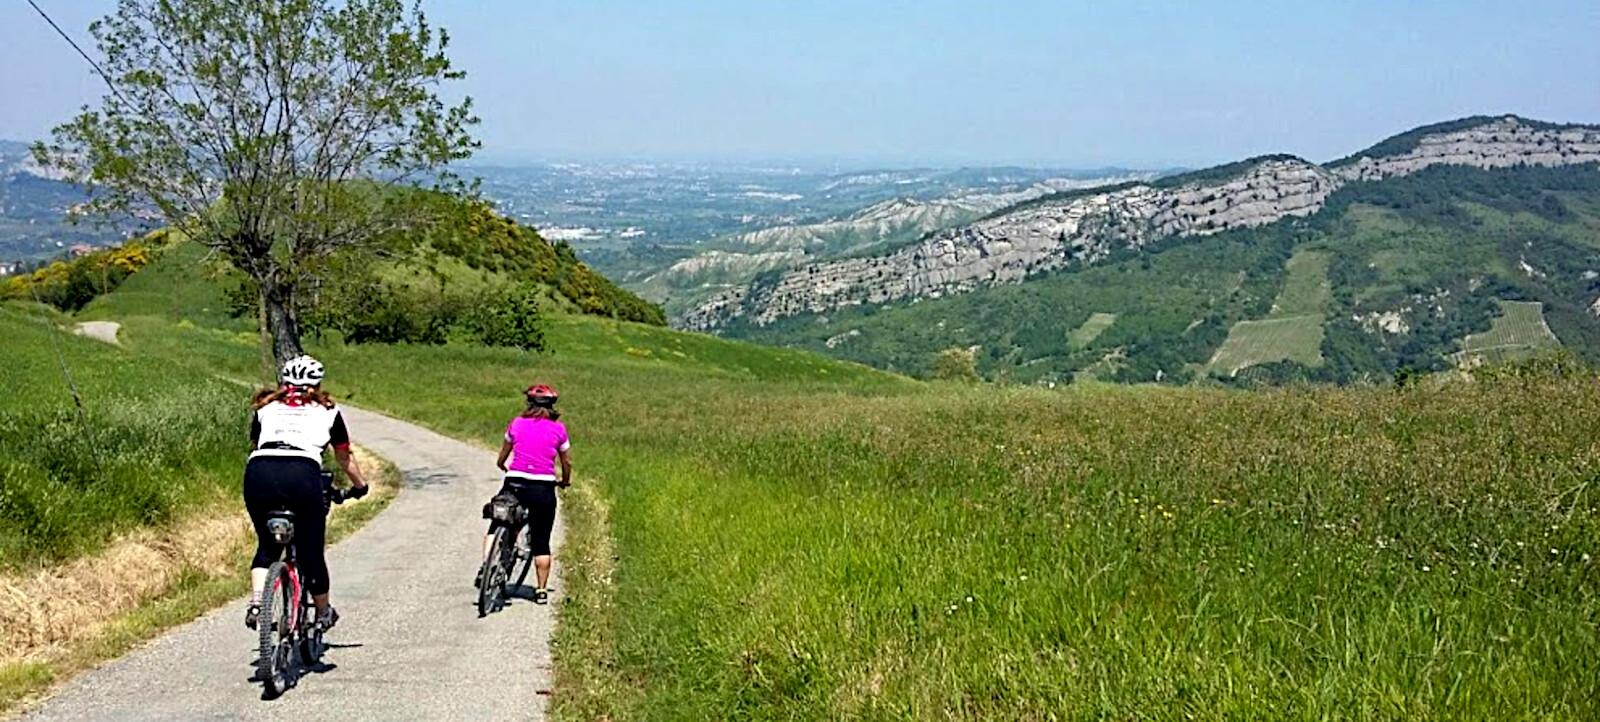 Colline modenesi in bici